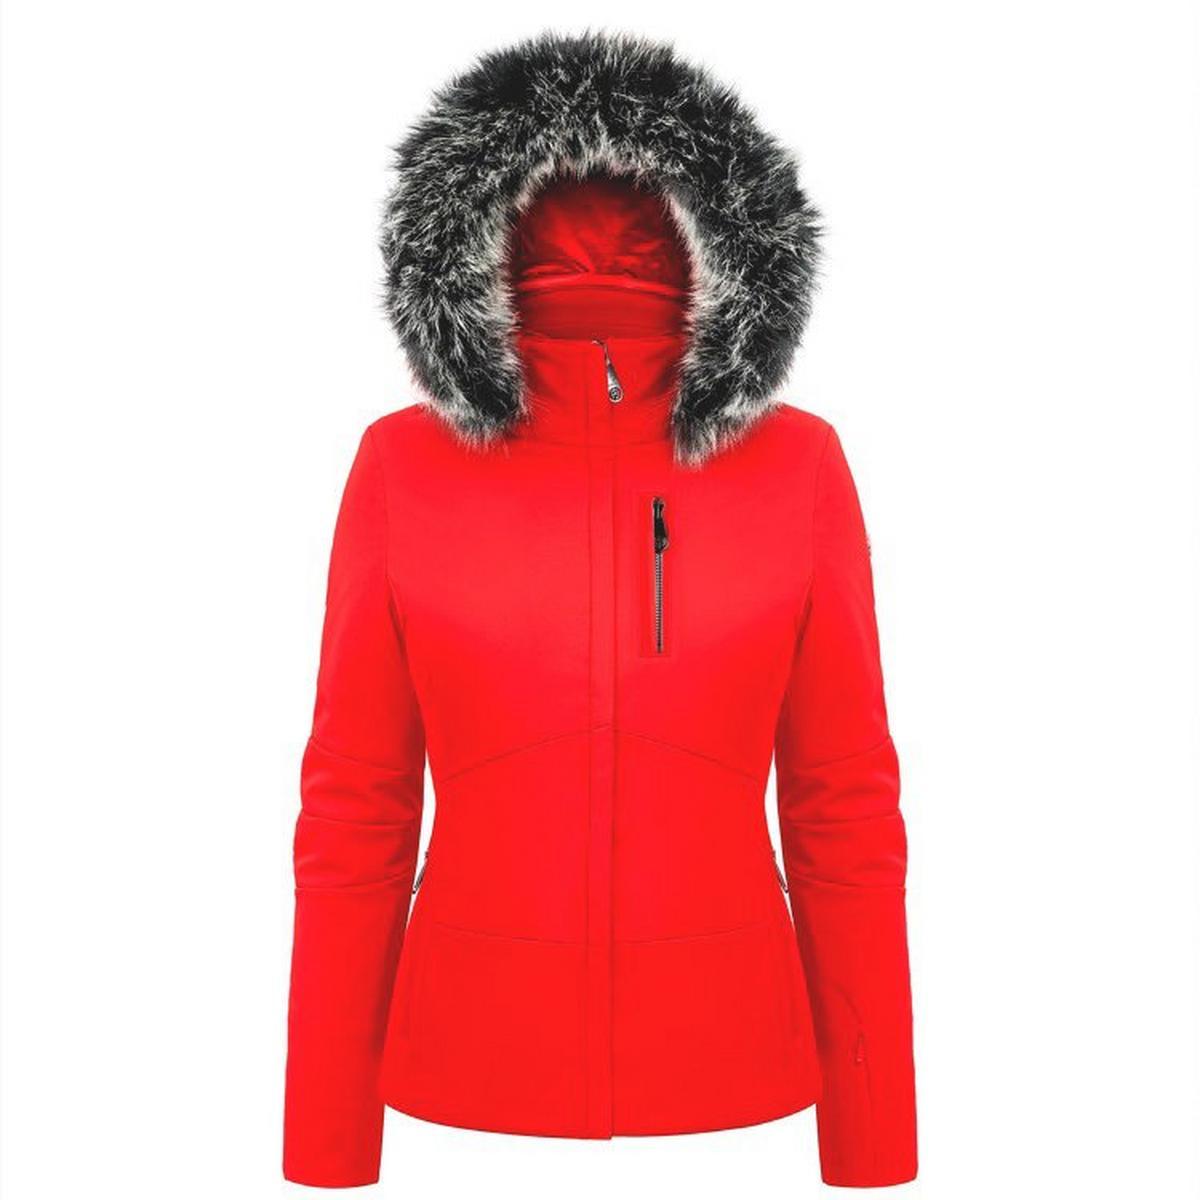 Poivre Blanc Women's Stretch Ski Jacket - Scarlet Red